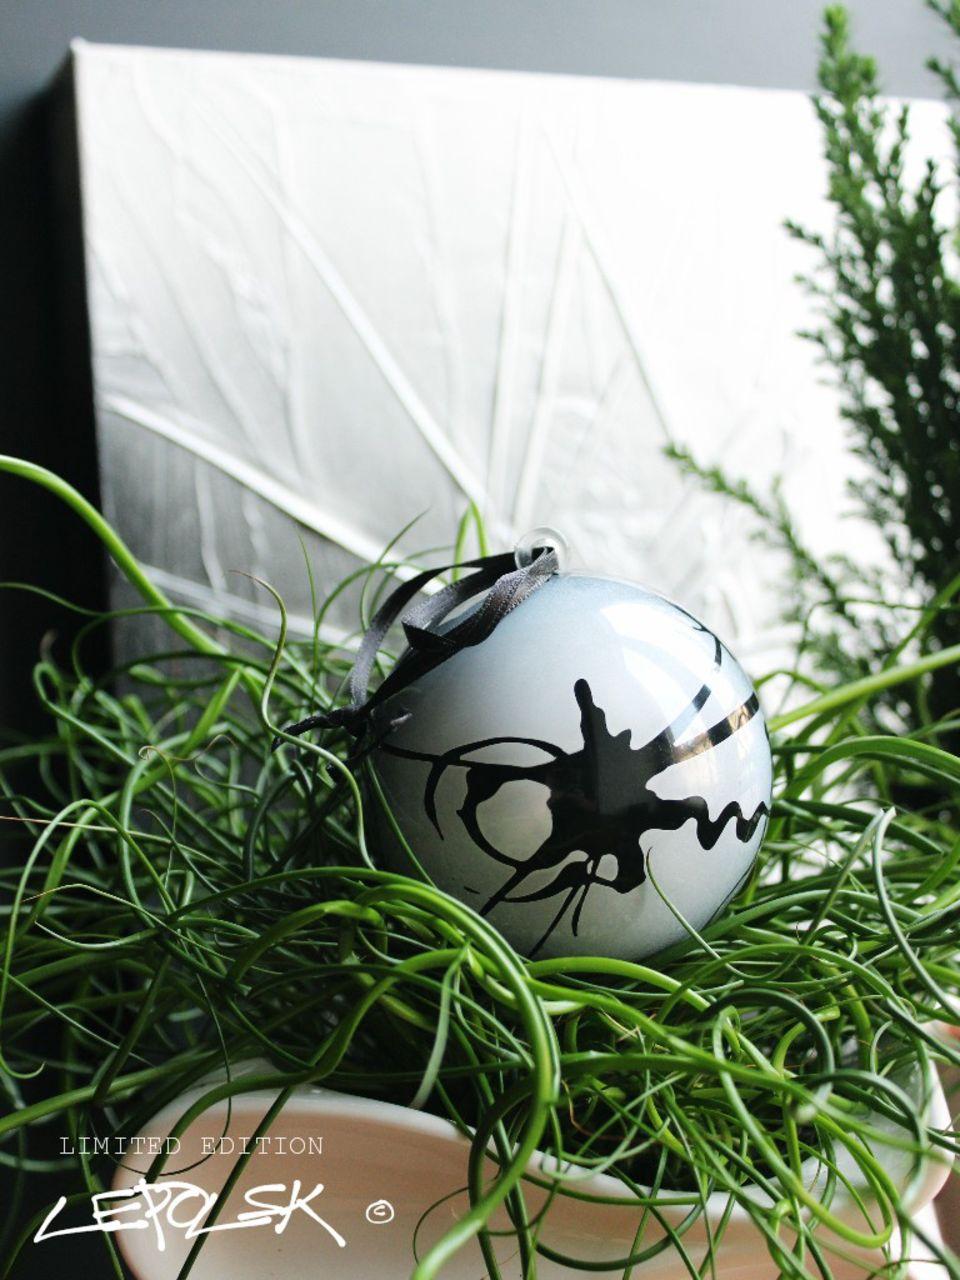 LEPOLSK MATUSZEWSKI WINTER  La boule de Noel Lepolsk Matuszewski